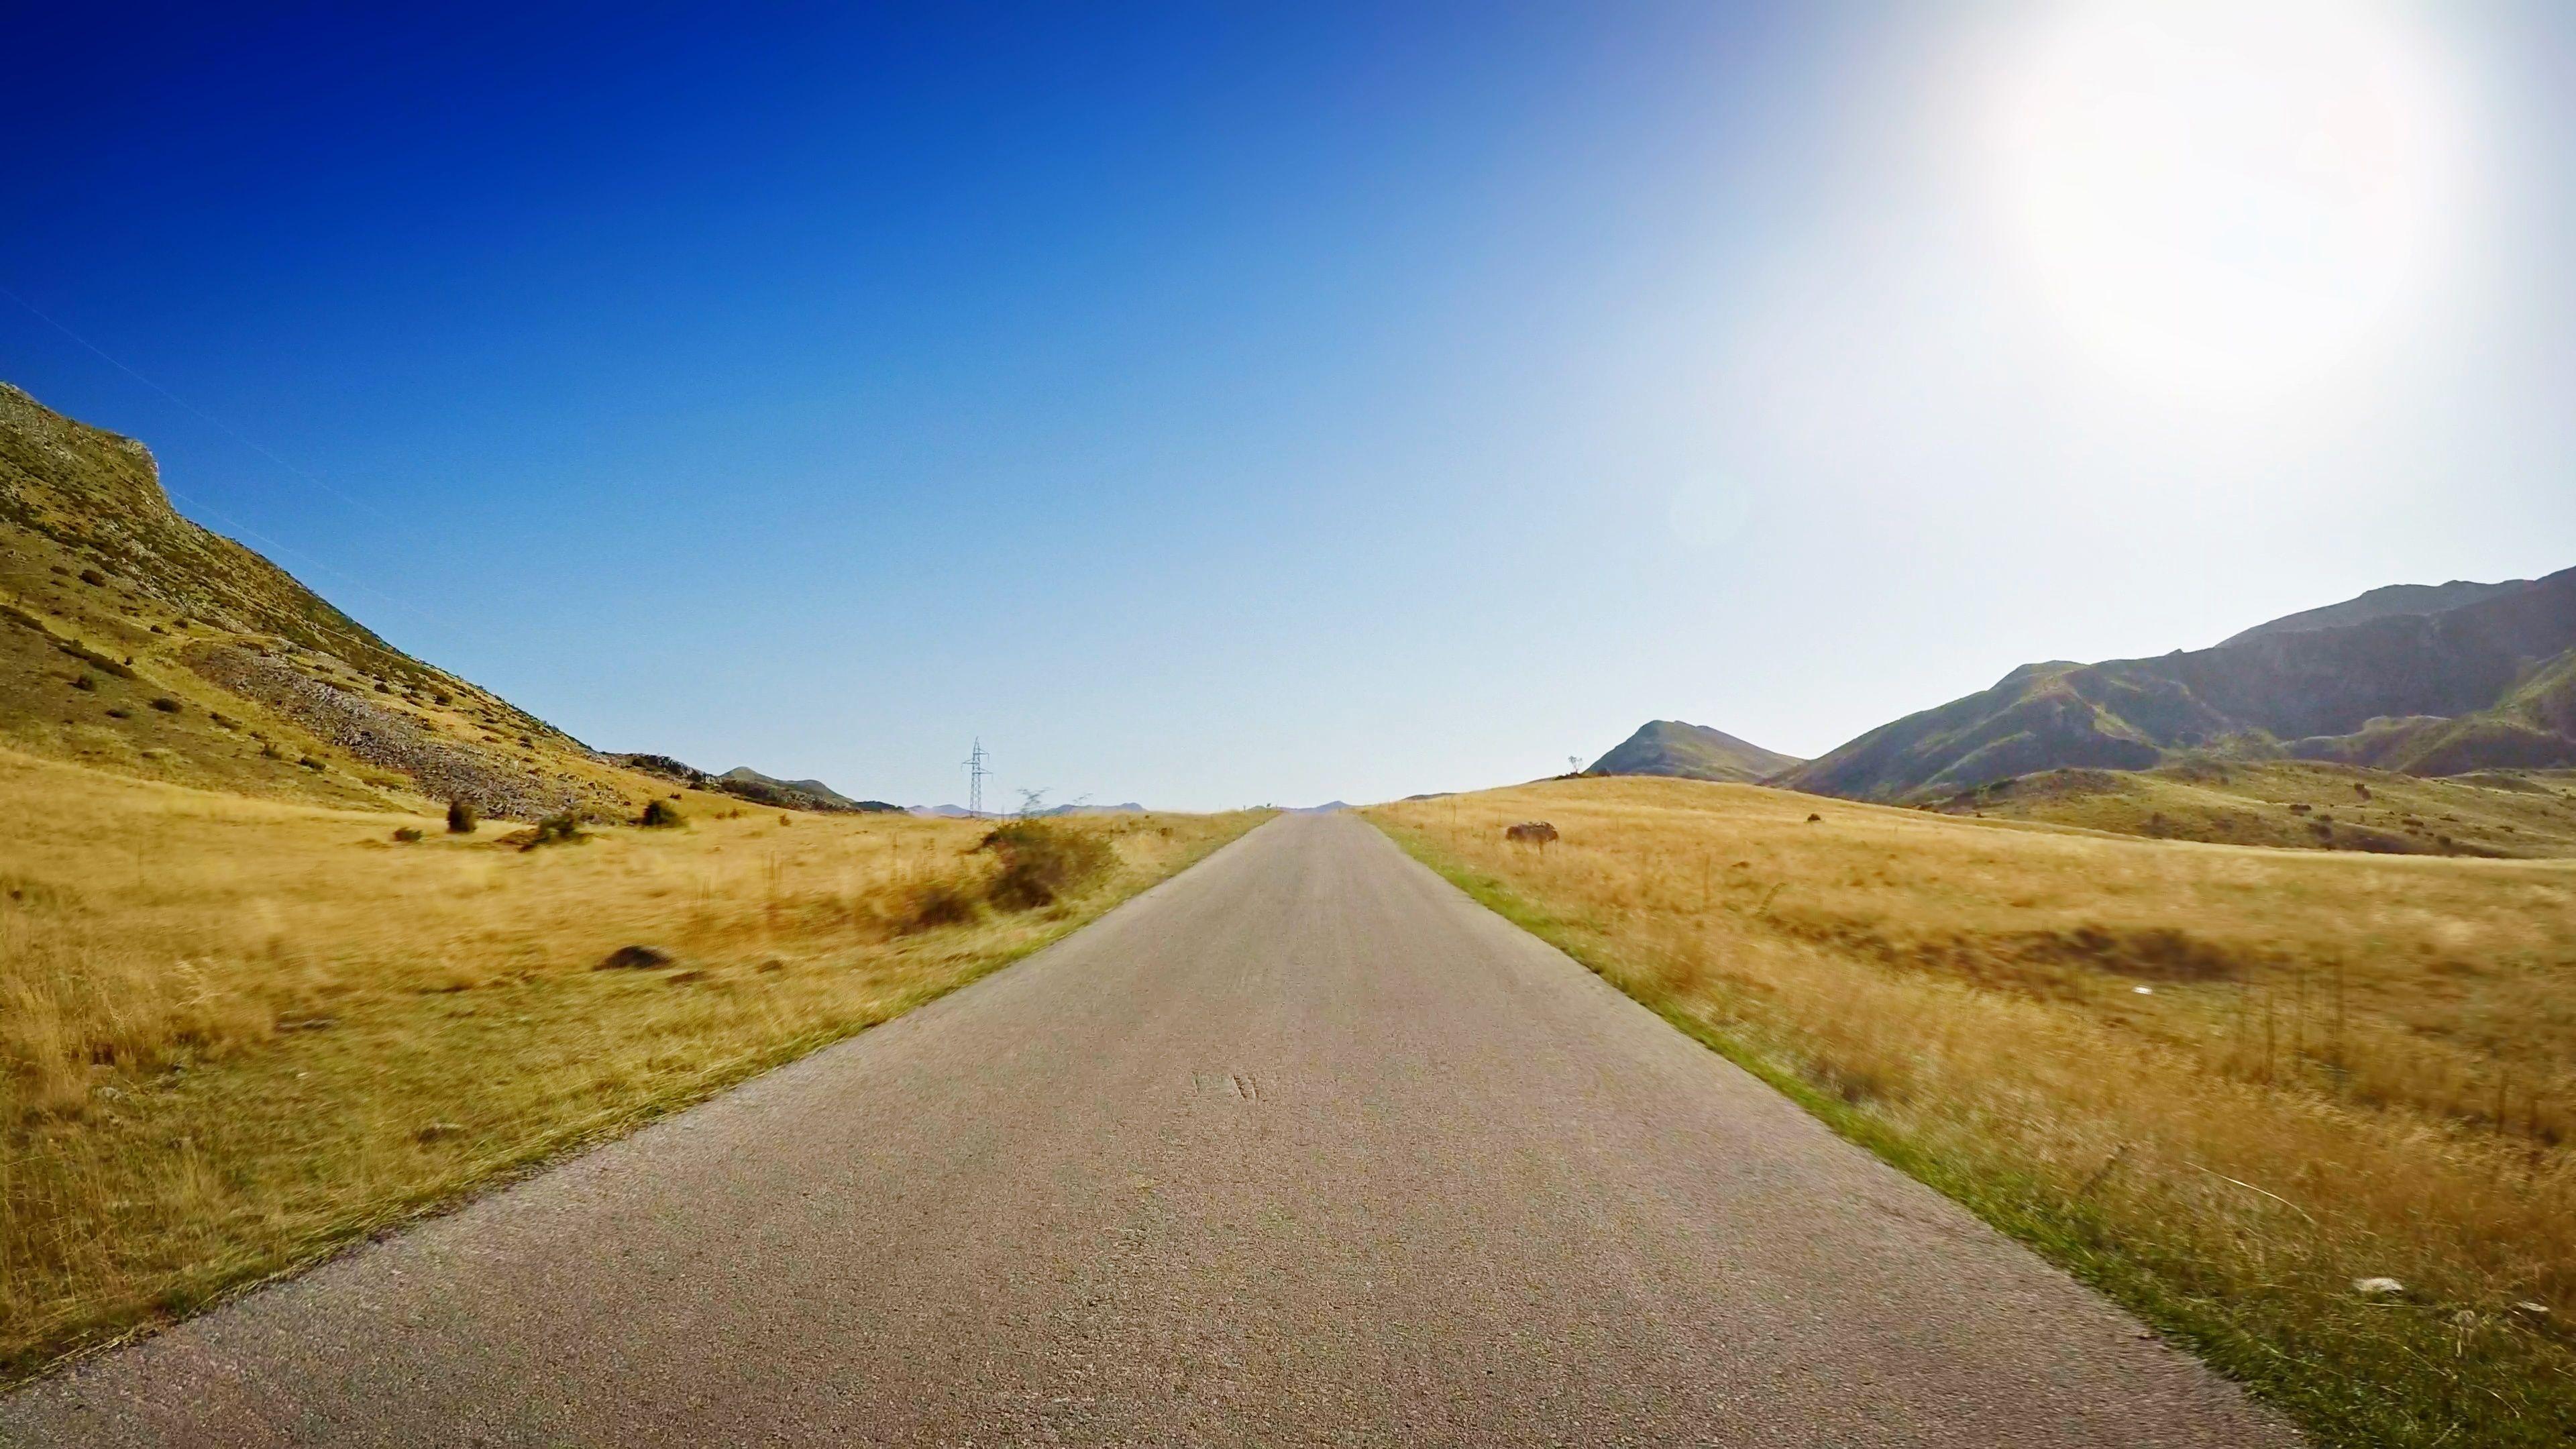 Pov drive upland countryside nature grassland shining sun